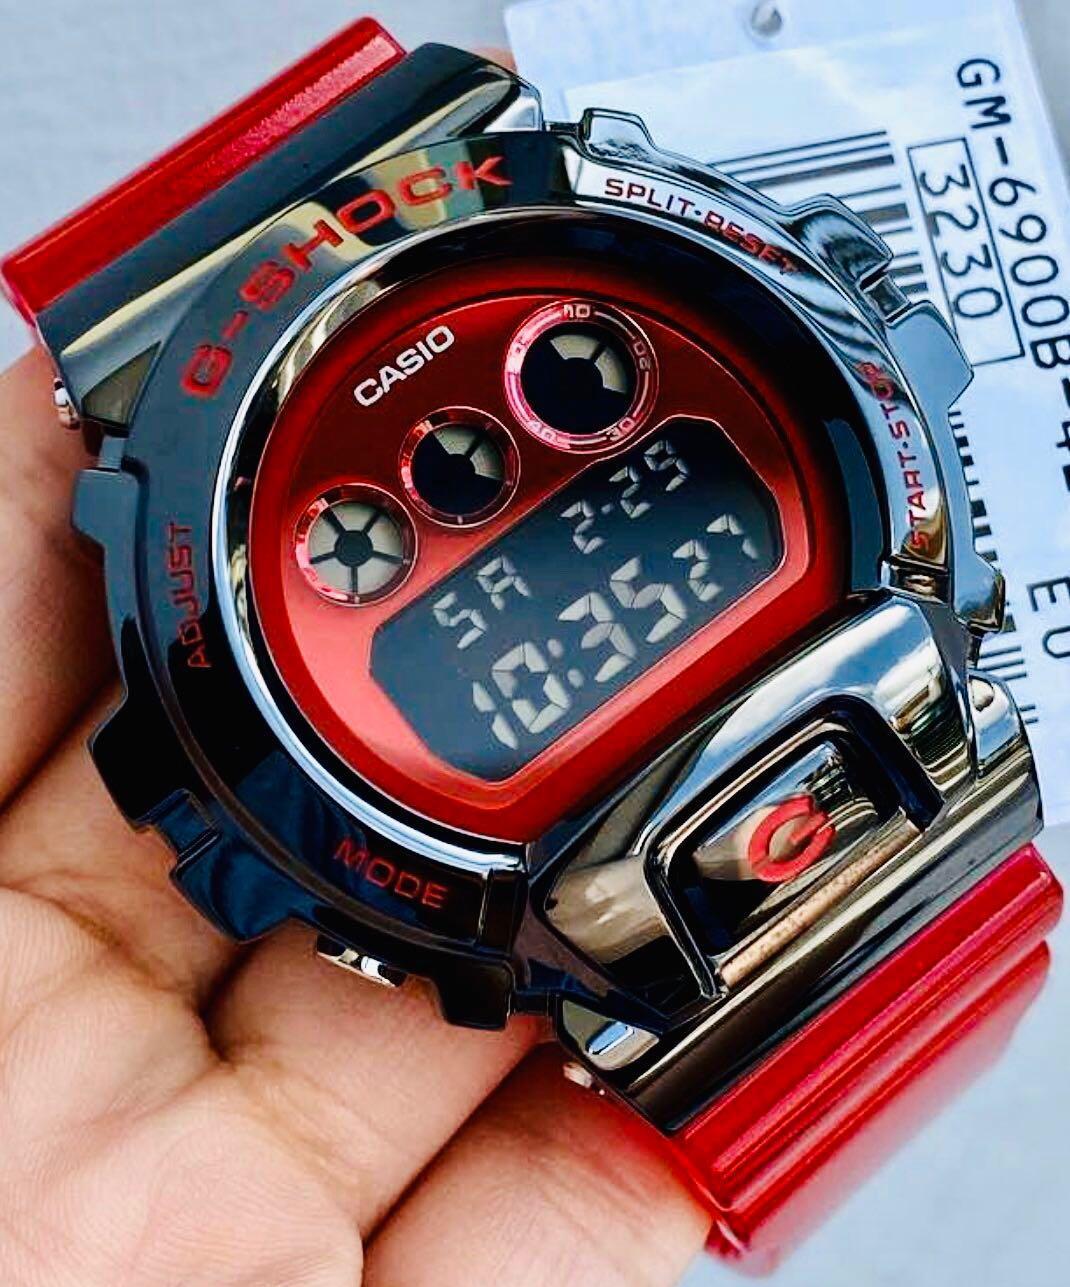 NEW🌟EDITION : GSHOCK UNISEX DIVER SPORTS WATCH : 100% ORIGINAL AUTHENTIC CASIO G-SHOCK : GM-6900-1 / GM-6900B-4 / GM-6900G-9 / DW-6900 series